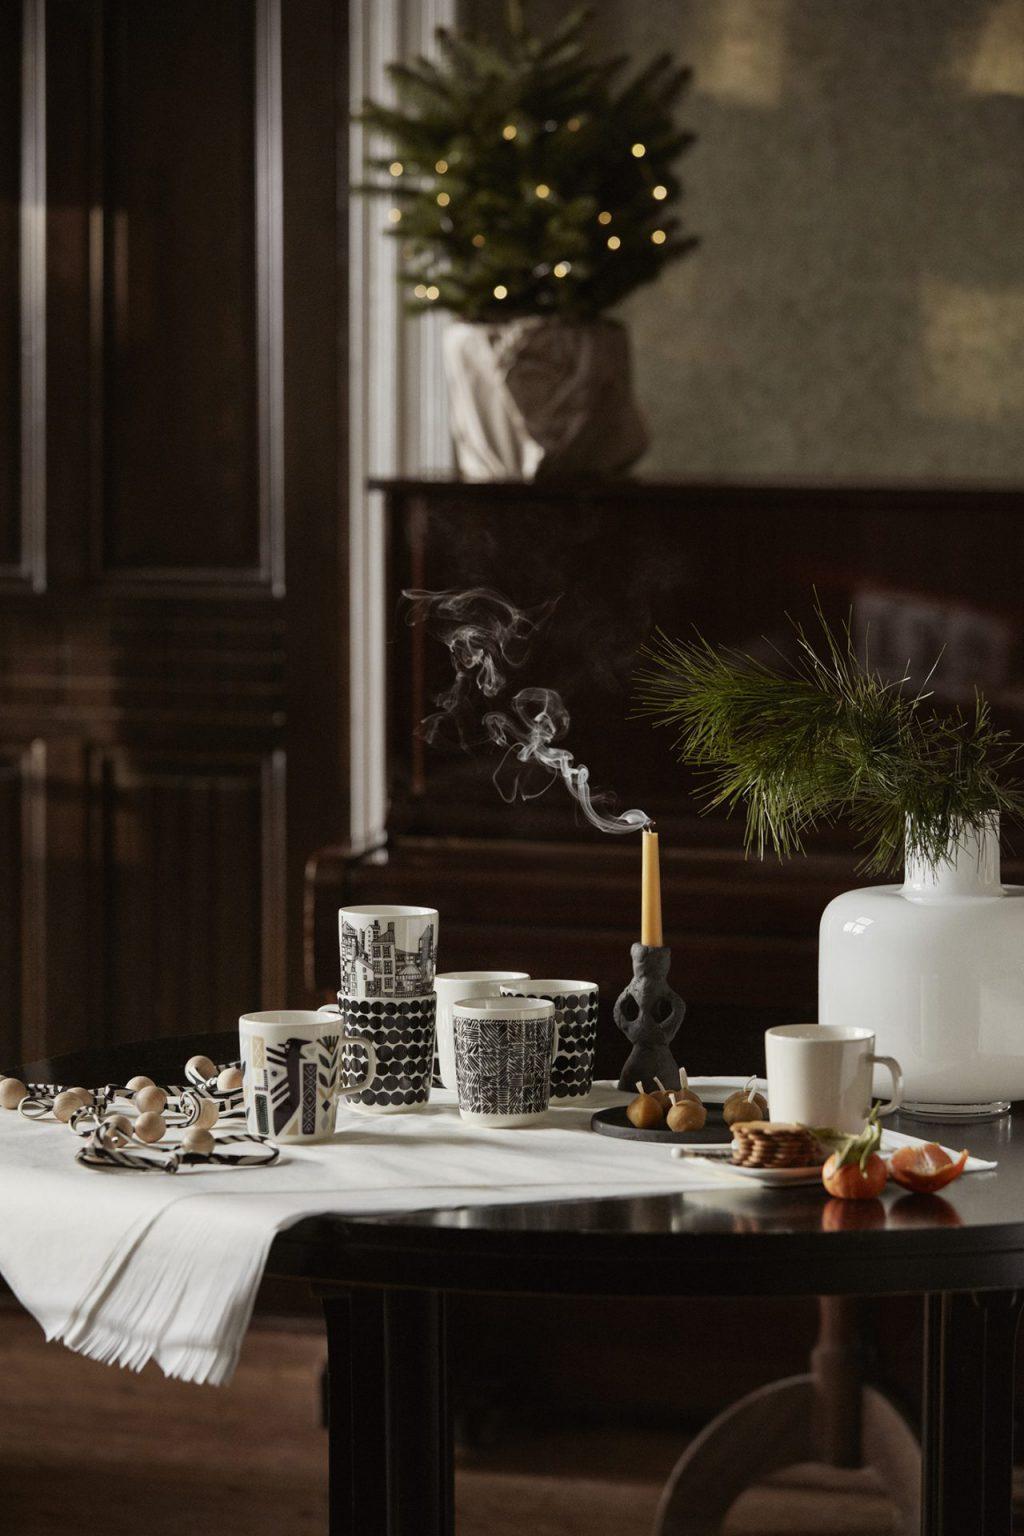 Marimekko Christmas 2018 for Marimekko by Susanna Vento